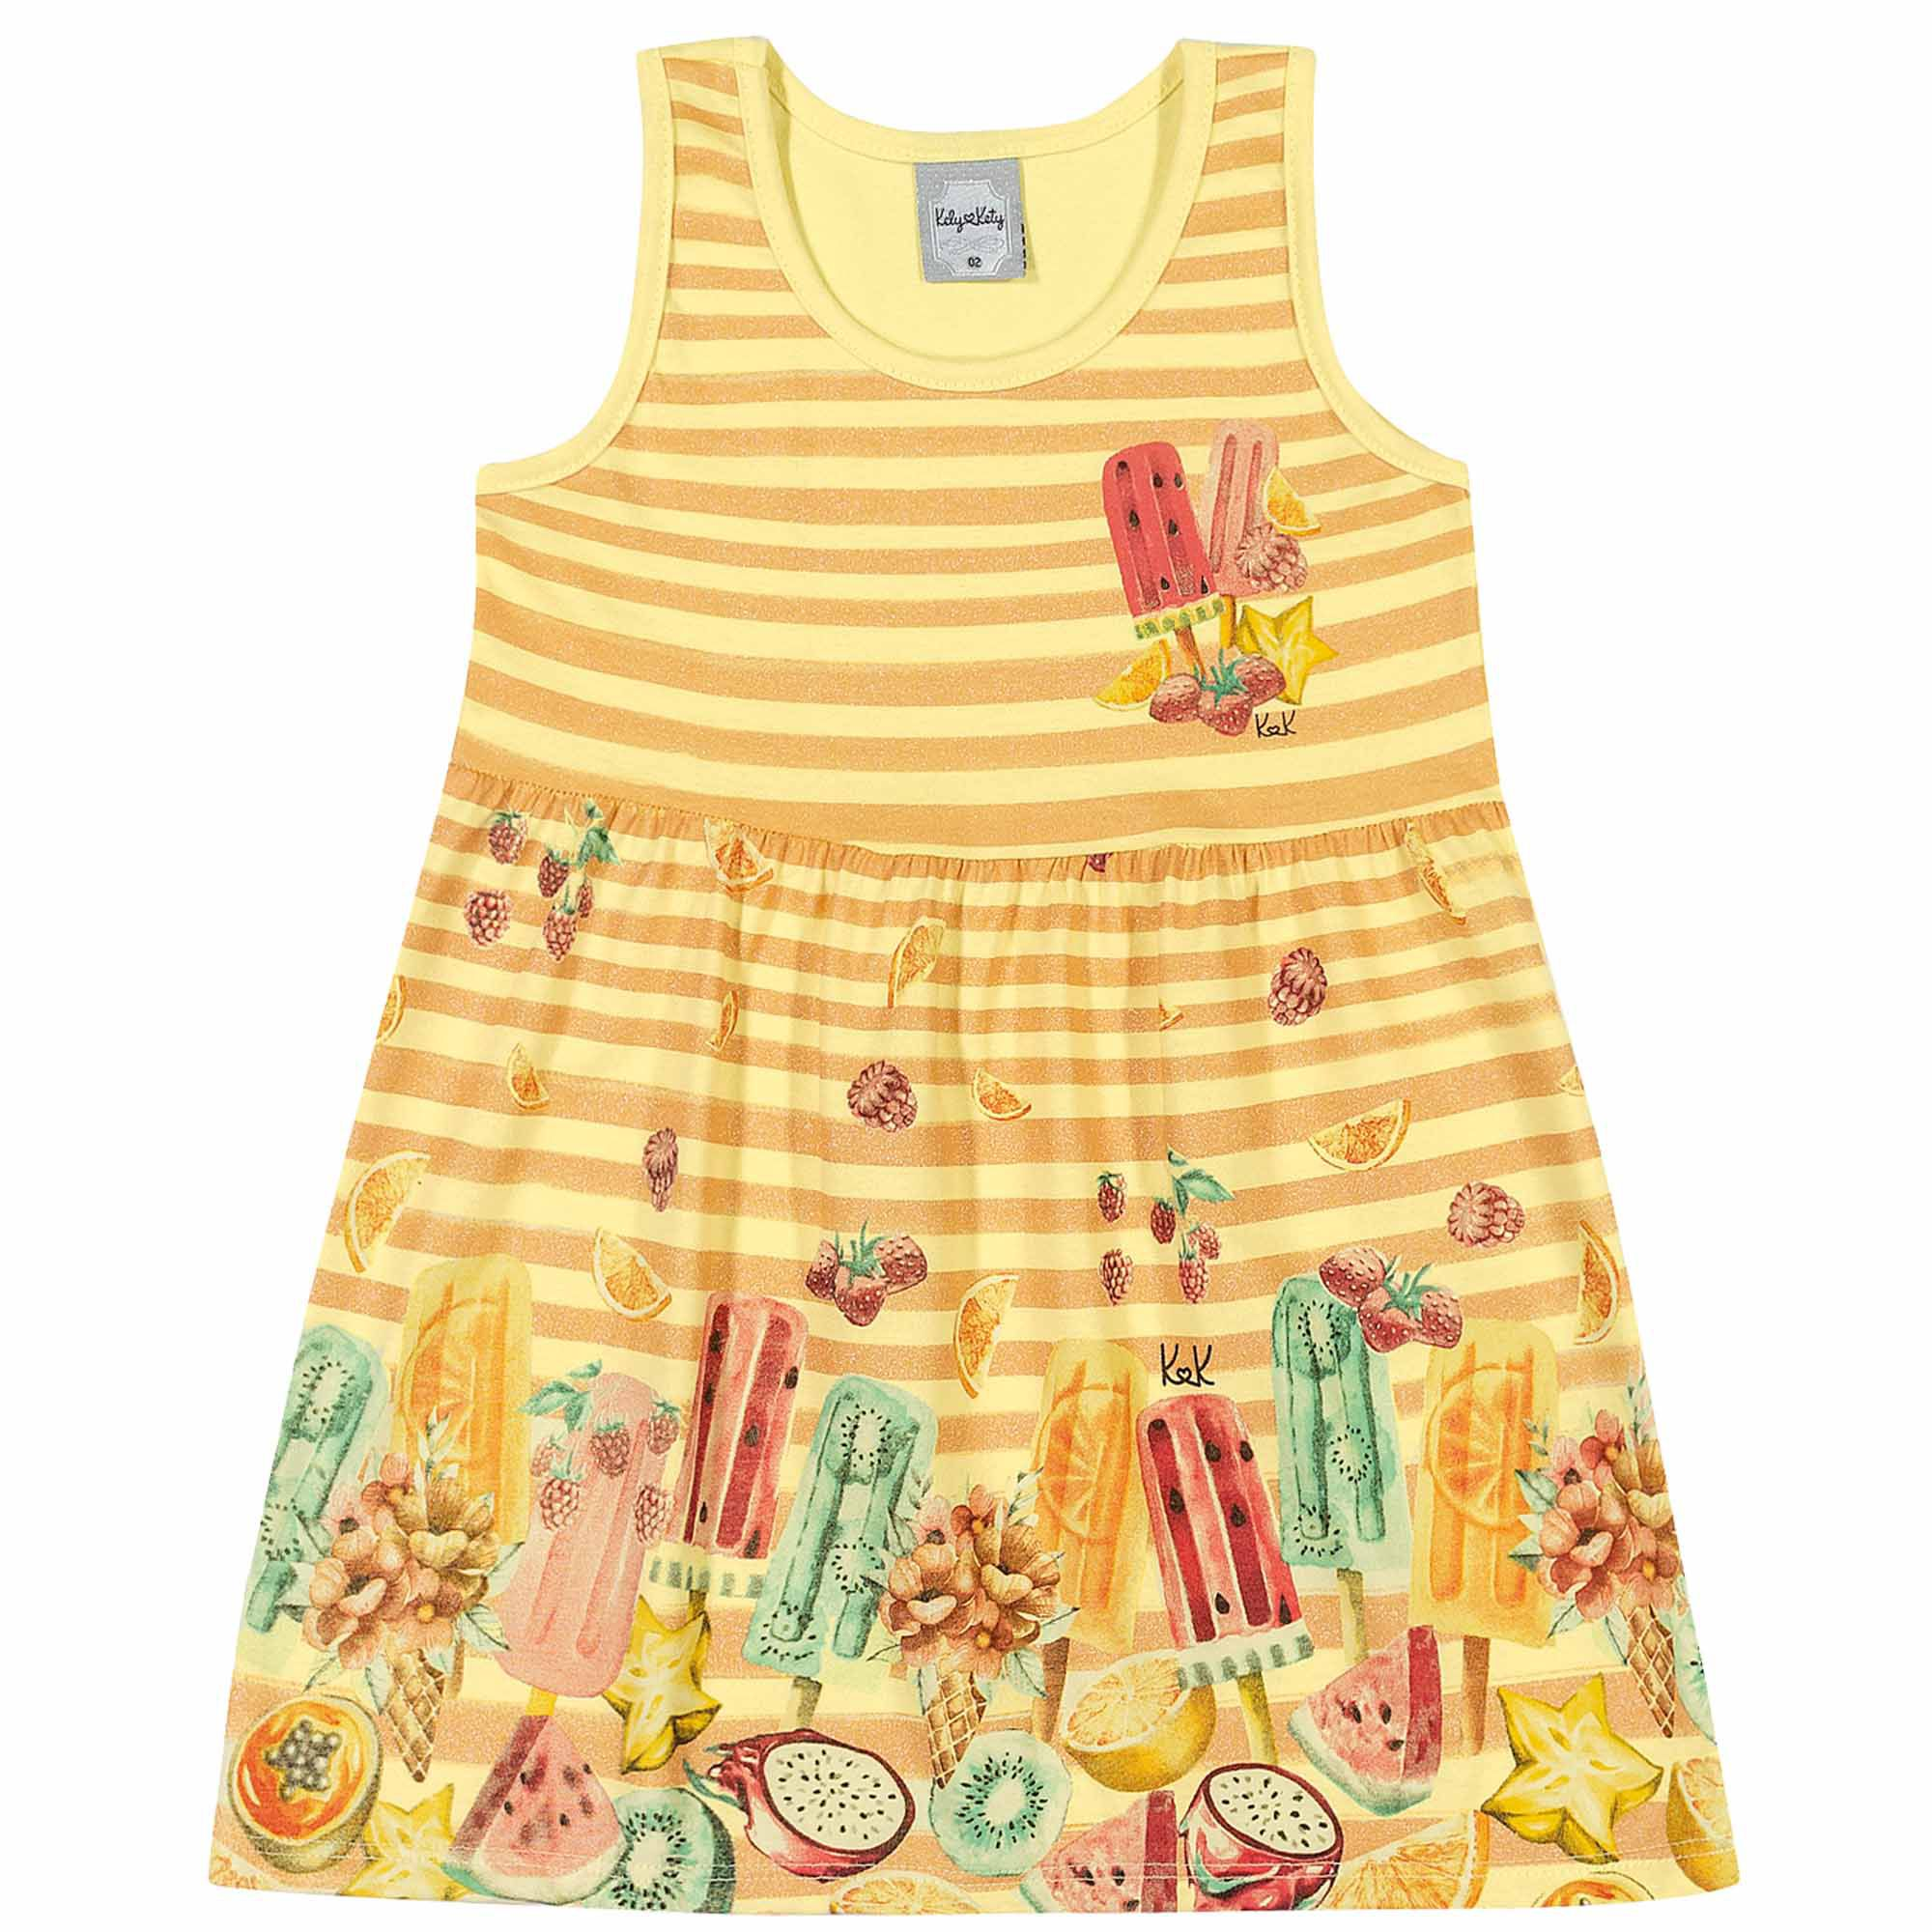 Vestido Verão Romitex Kely Kety Picolé de Frutas - 1 ao 3